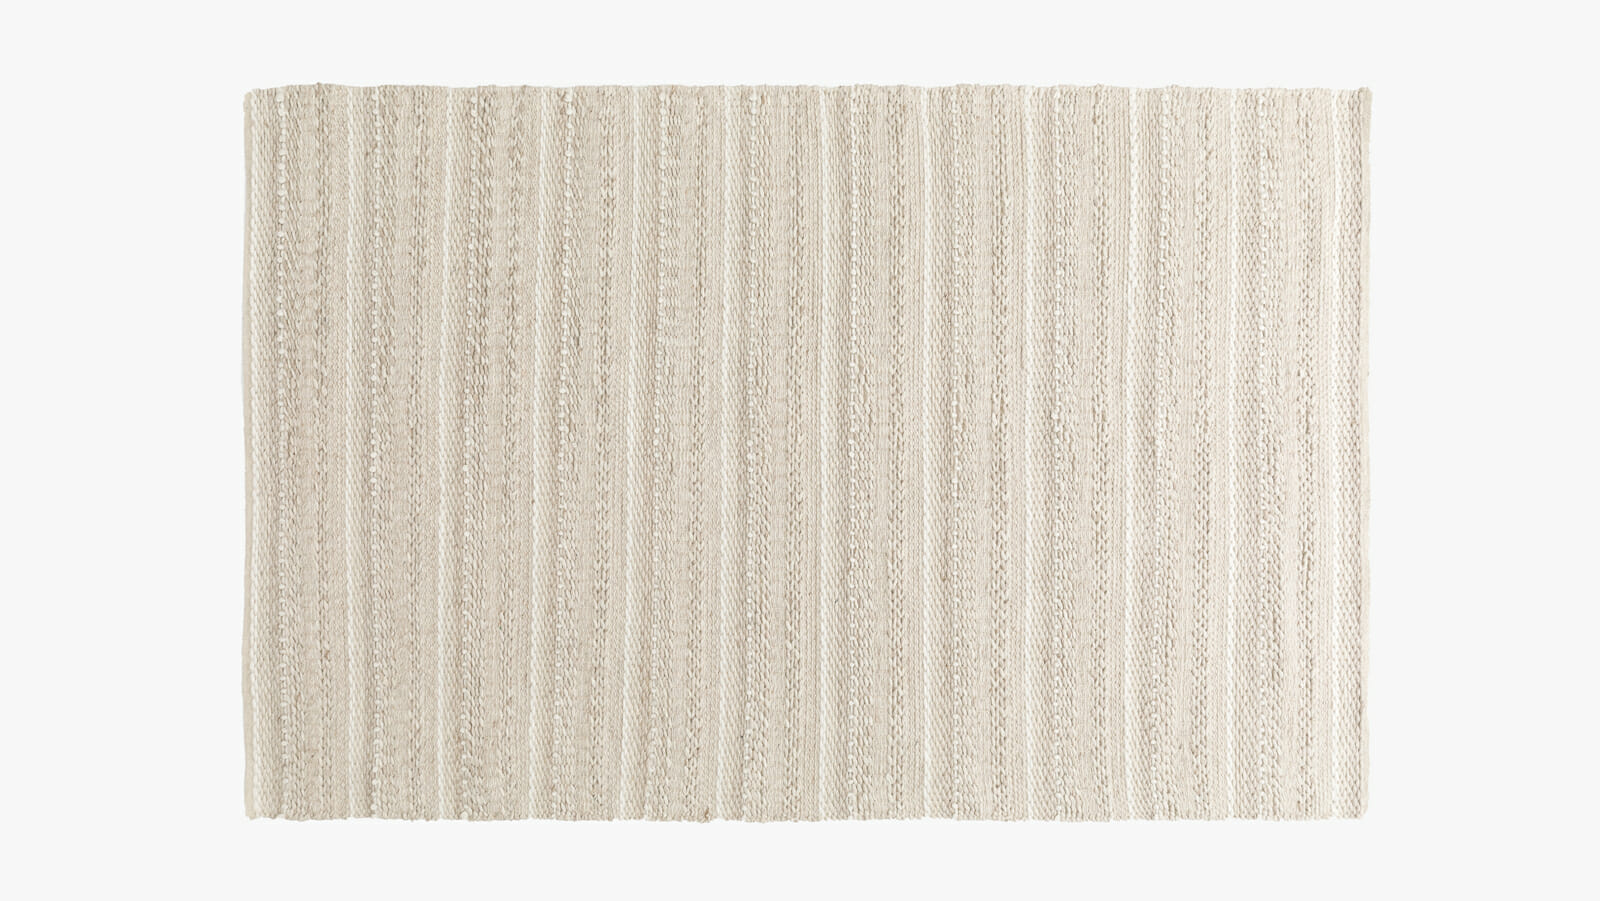 The Noa Sonoma rug